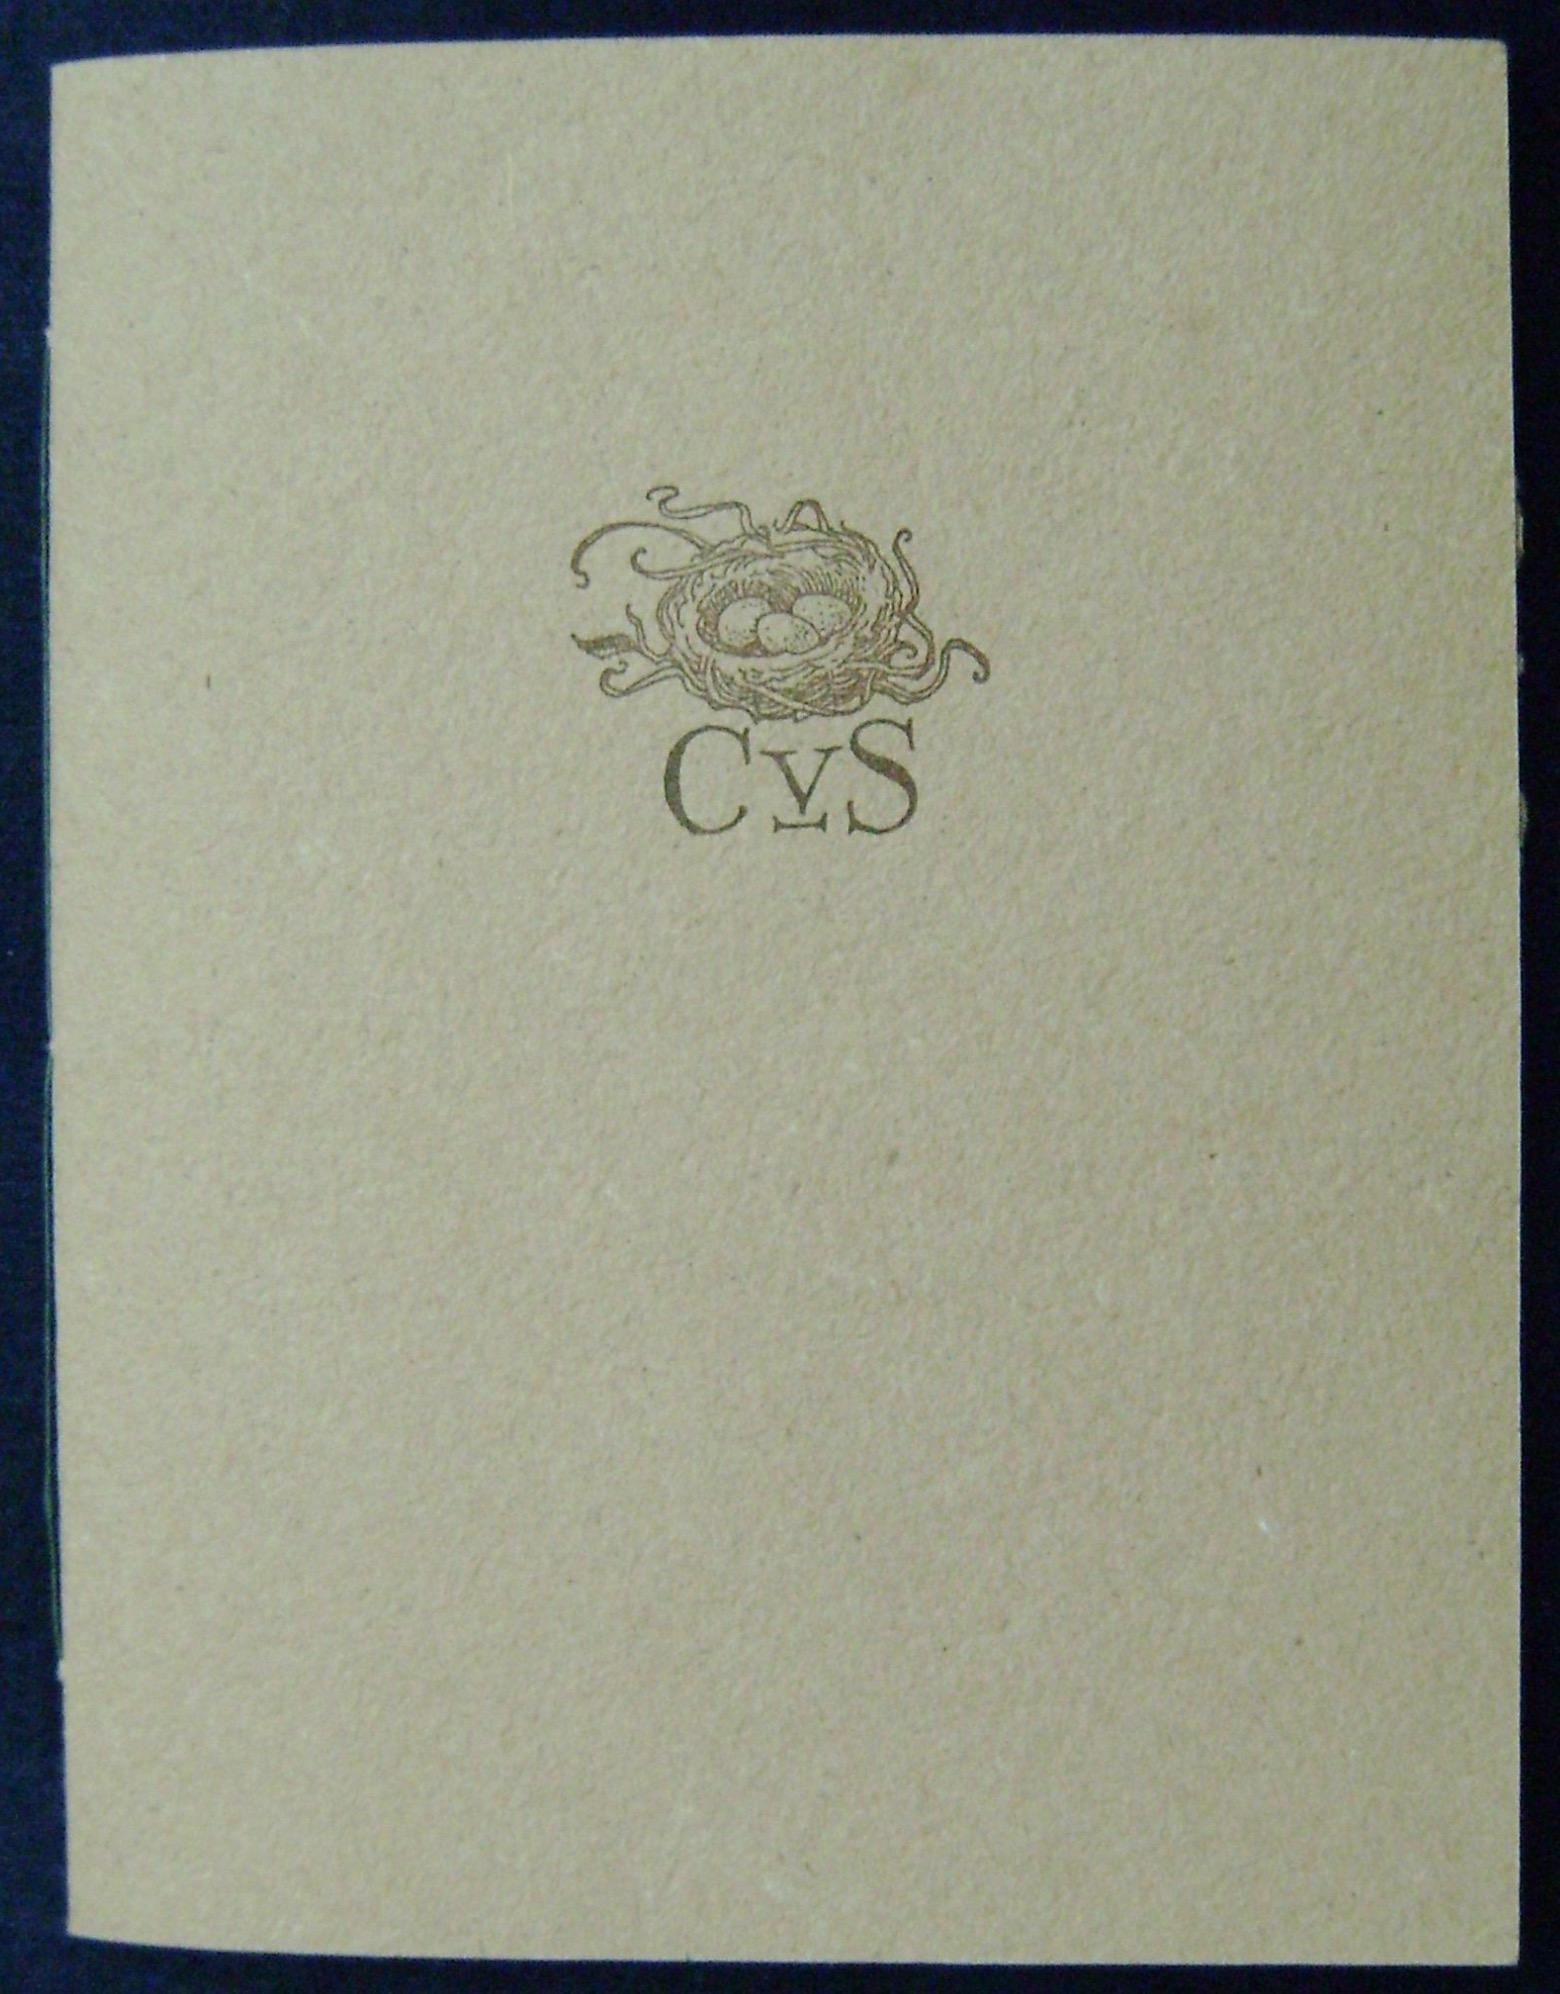 2004 CVS HM Annuals